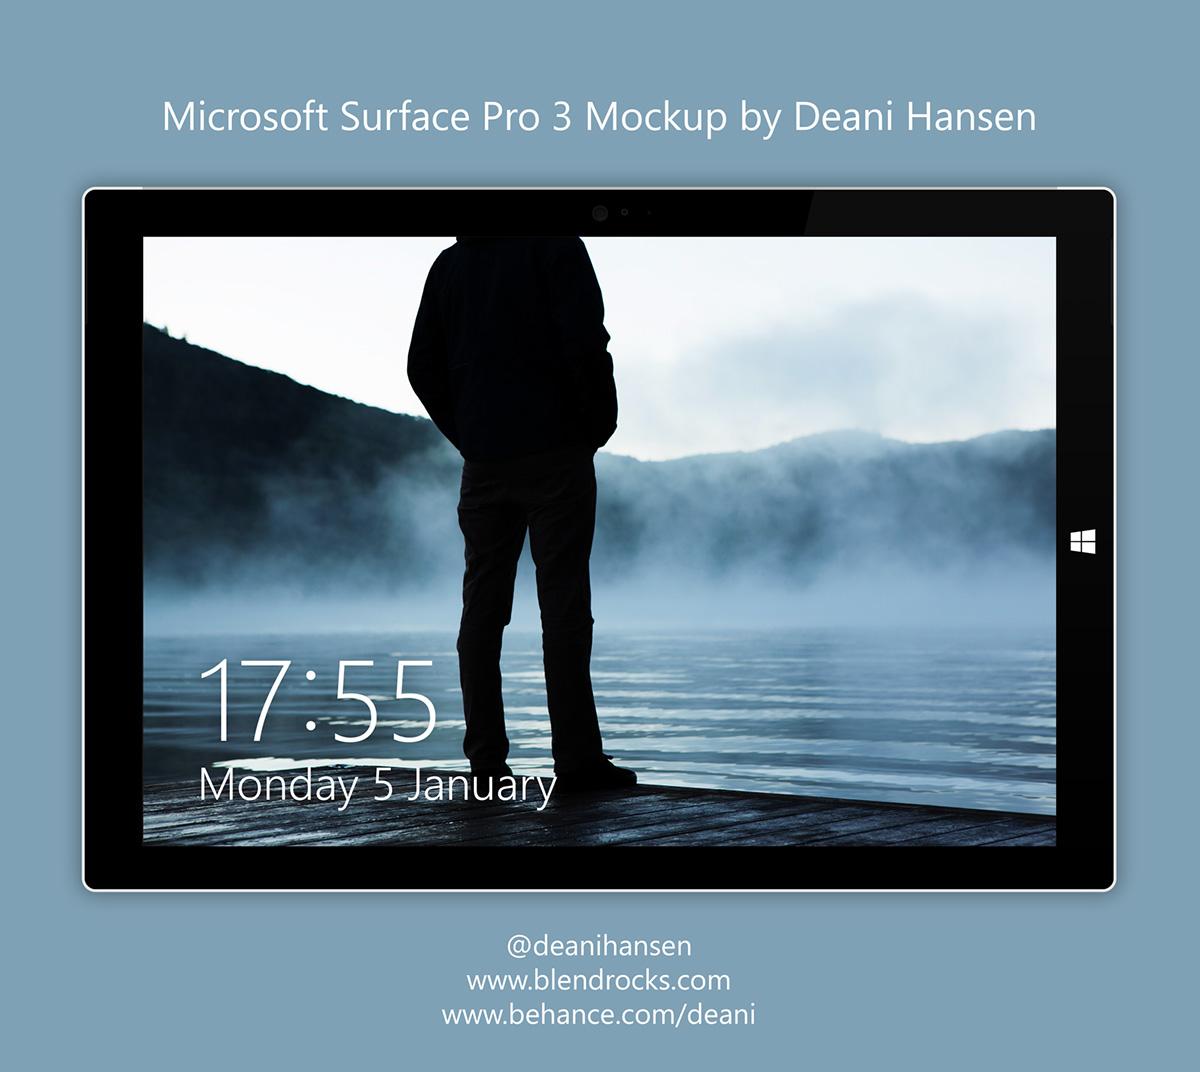 Microsoft surface surface pro surface pro 3 Windows 8 windows 10 Mockup device